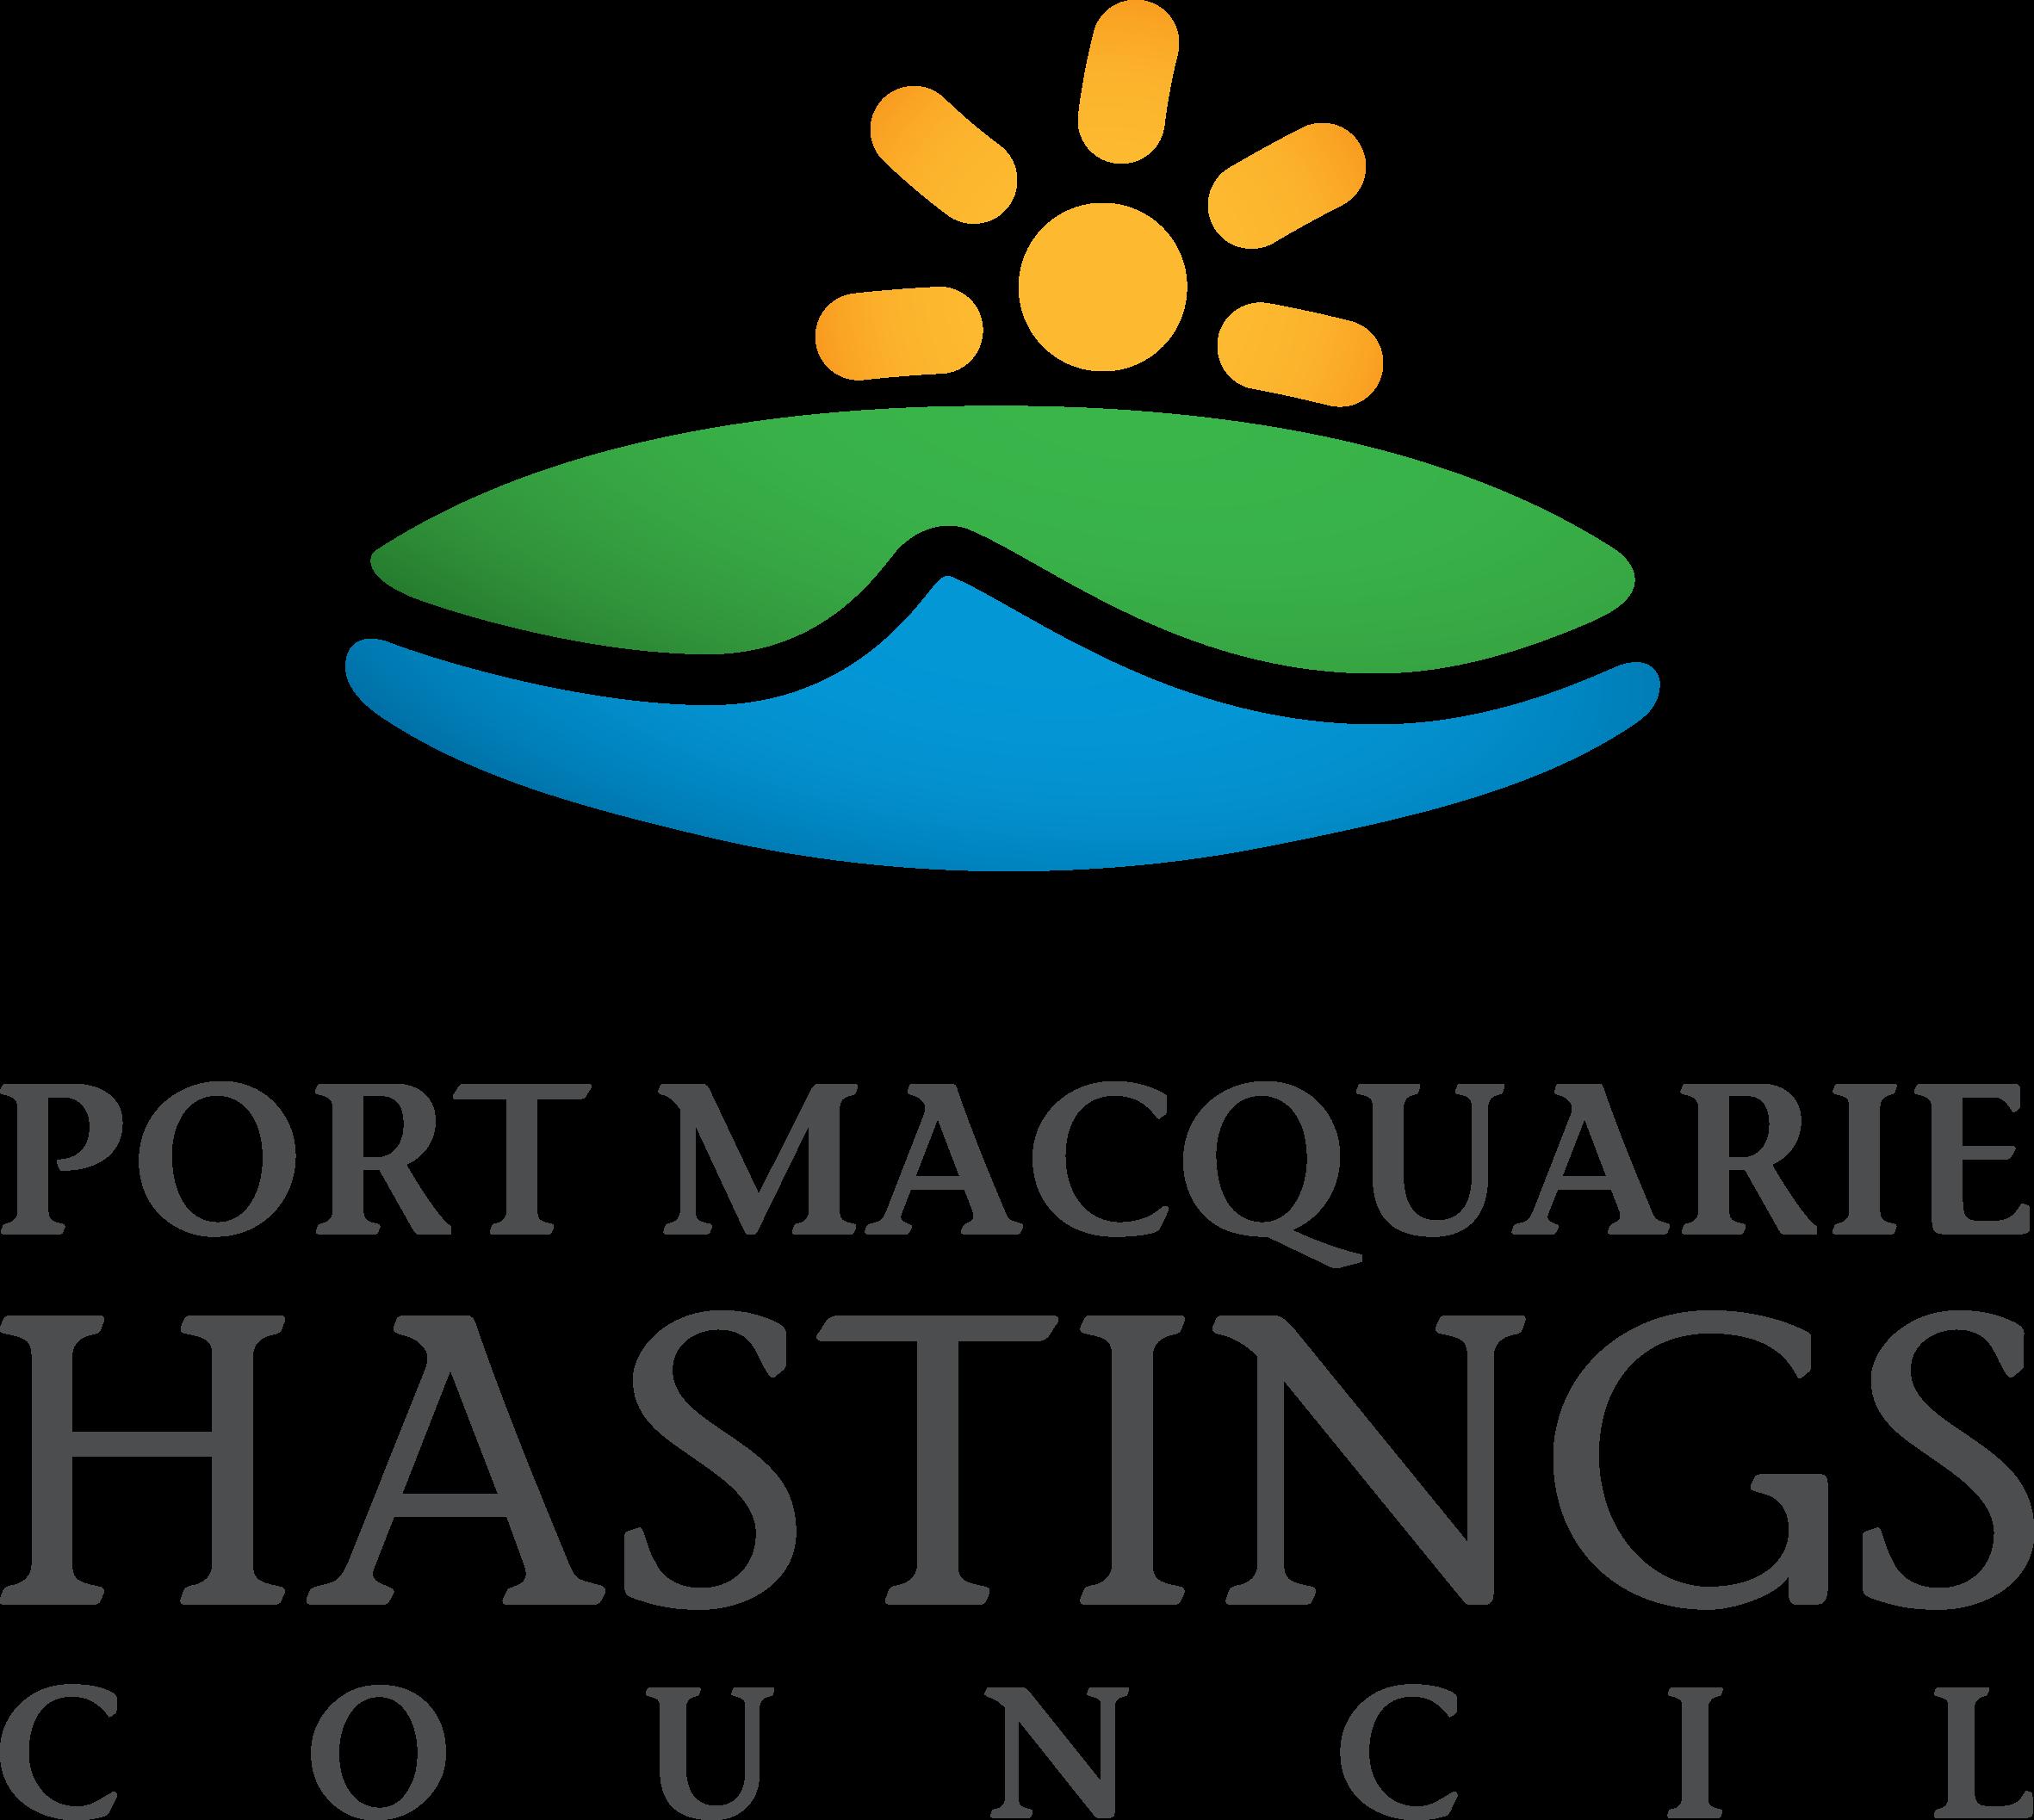 Port Macquarie Hastings Council Logo